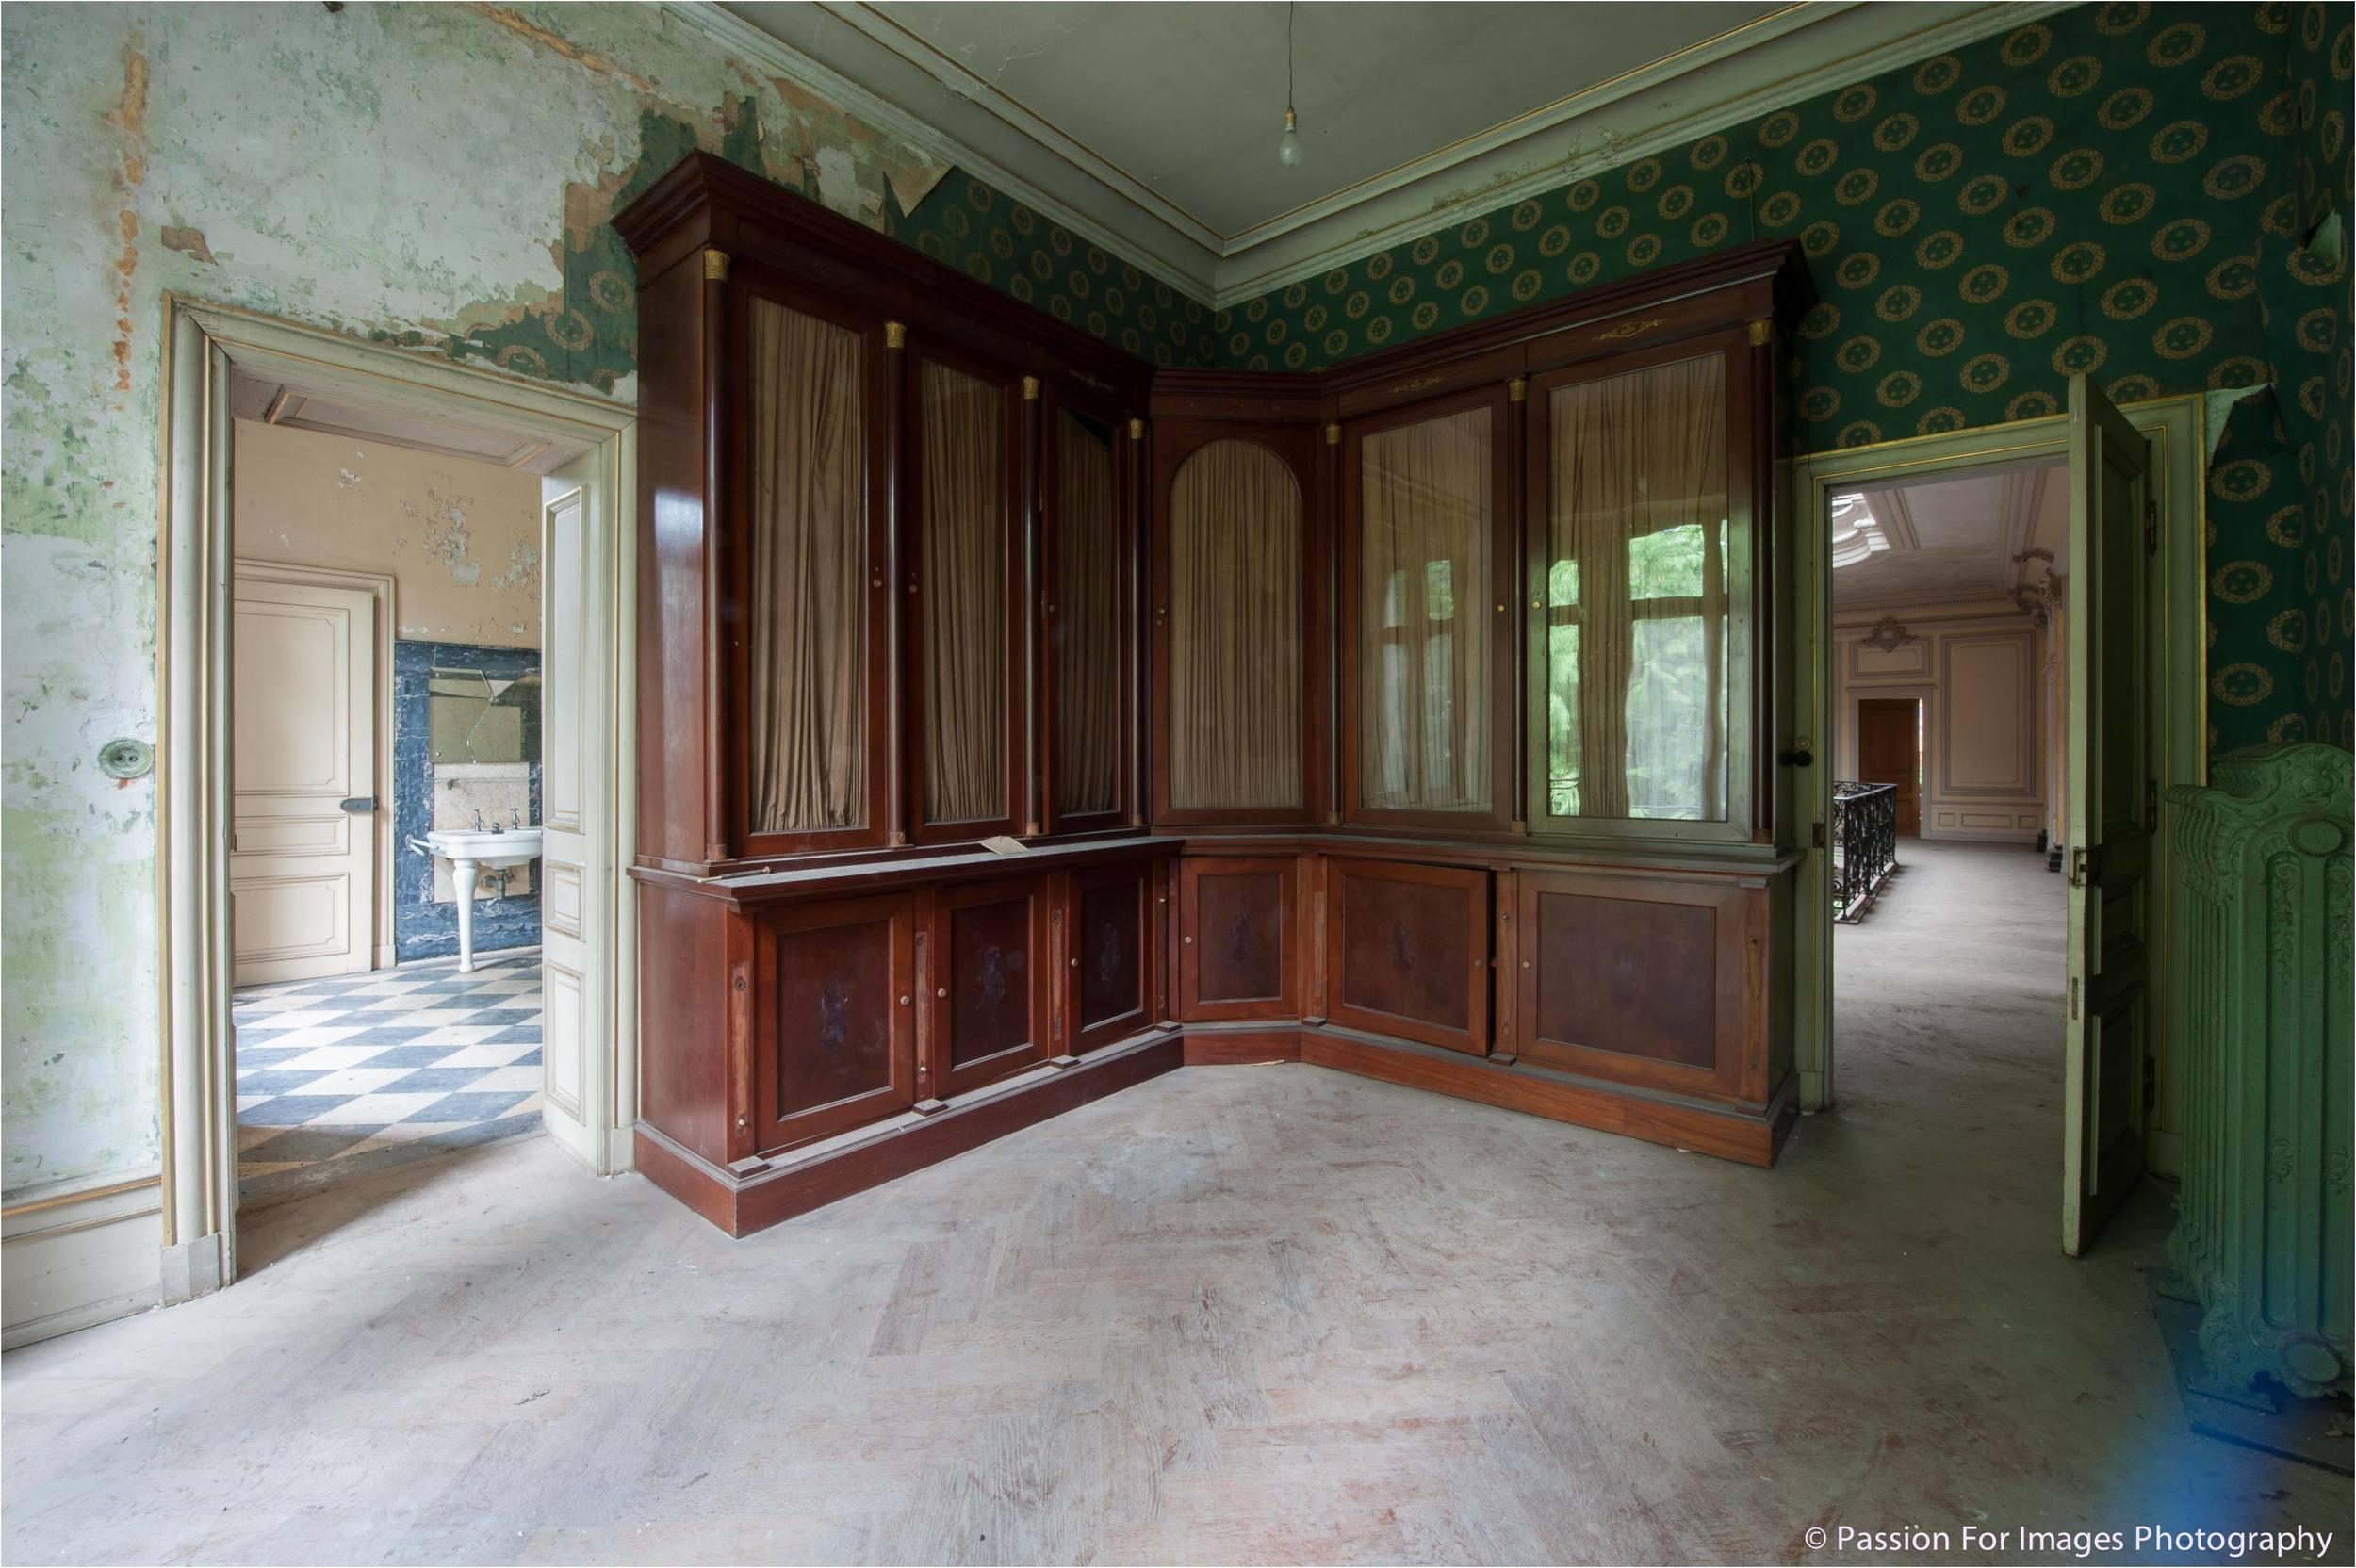 PFI__D7C0599_2014_08_Chateau_Lumiere.jpg